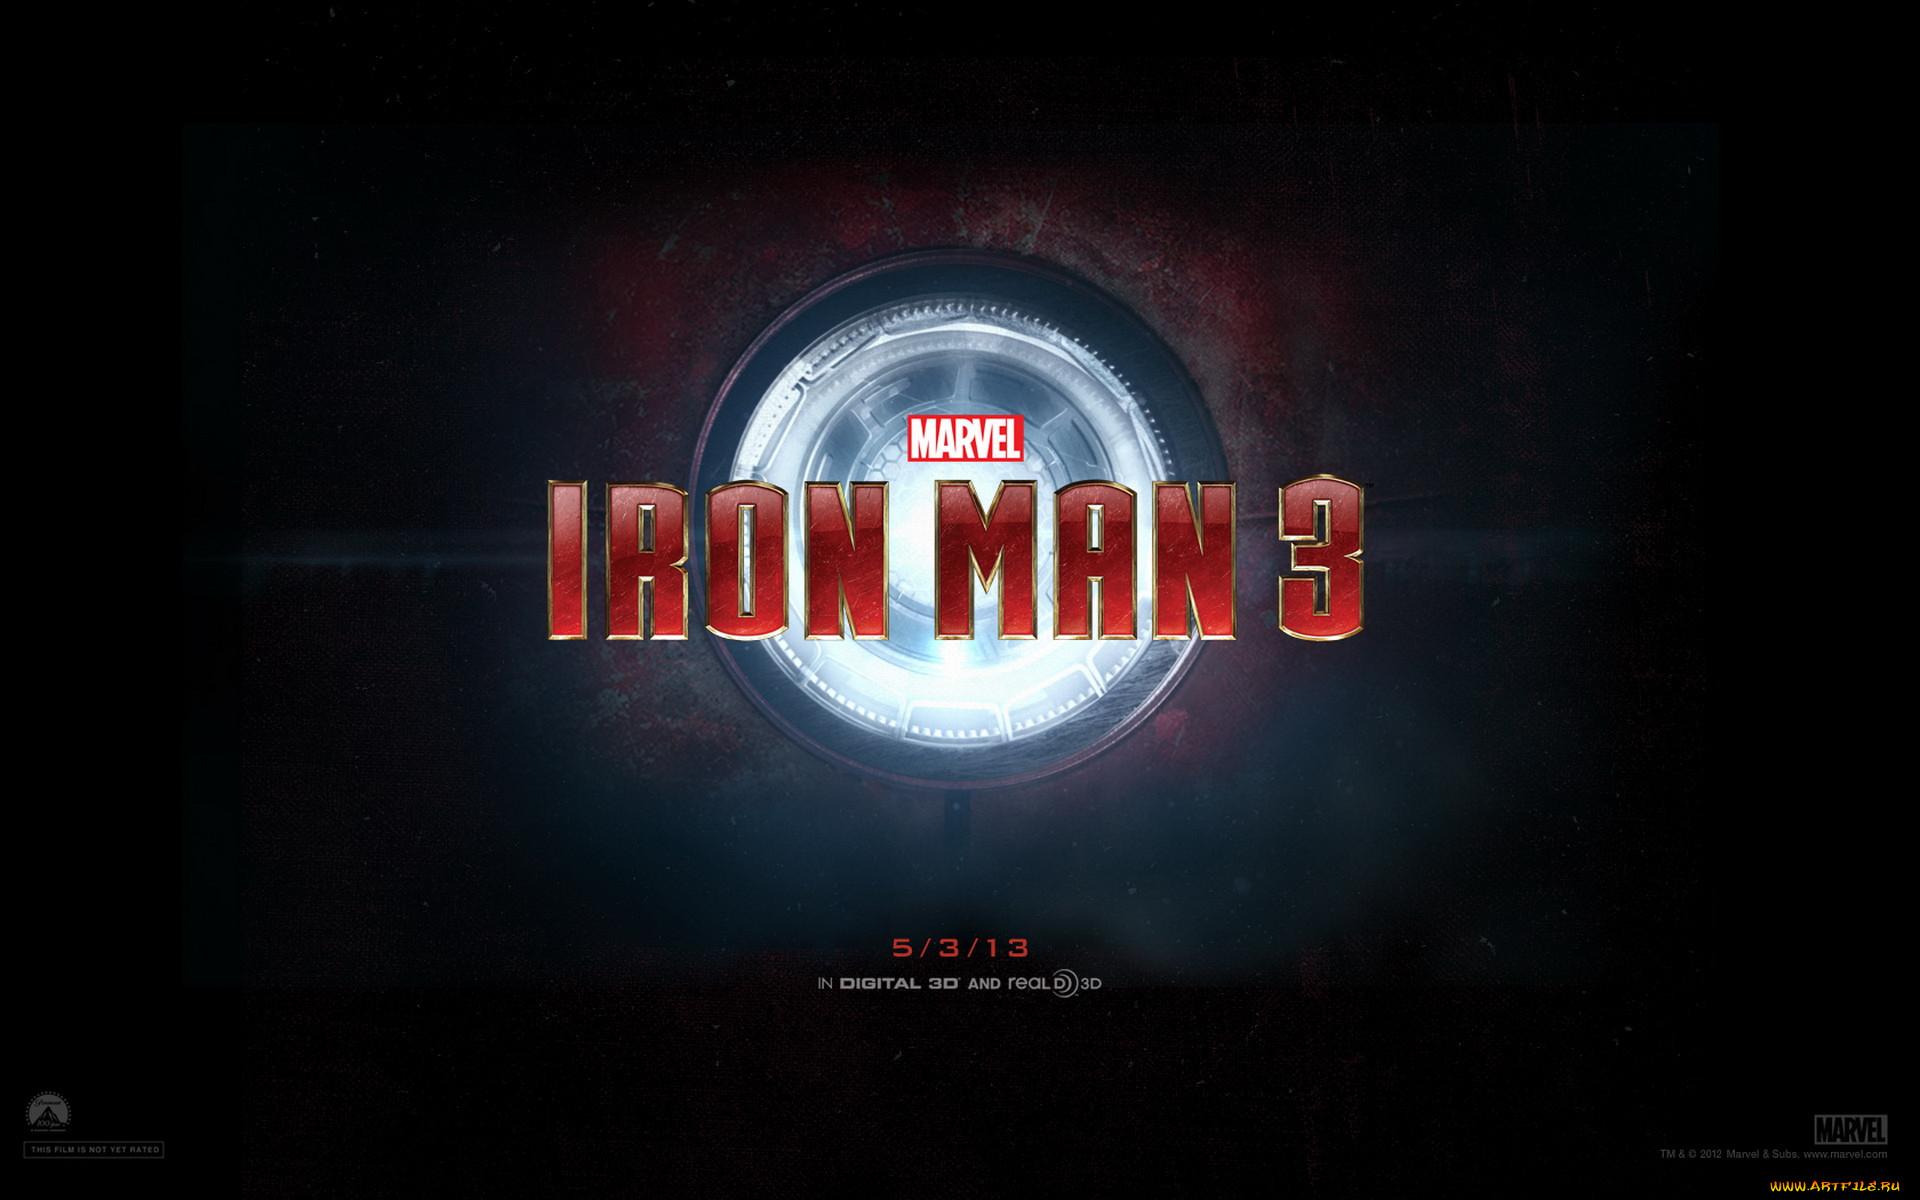 first marvel intro logo iron man 2008 - HD1680×1050